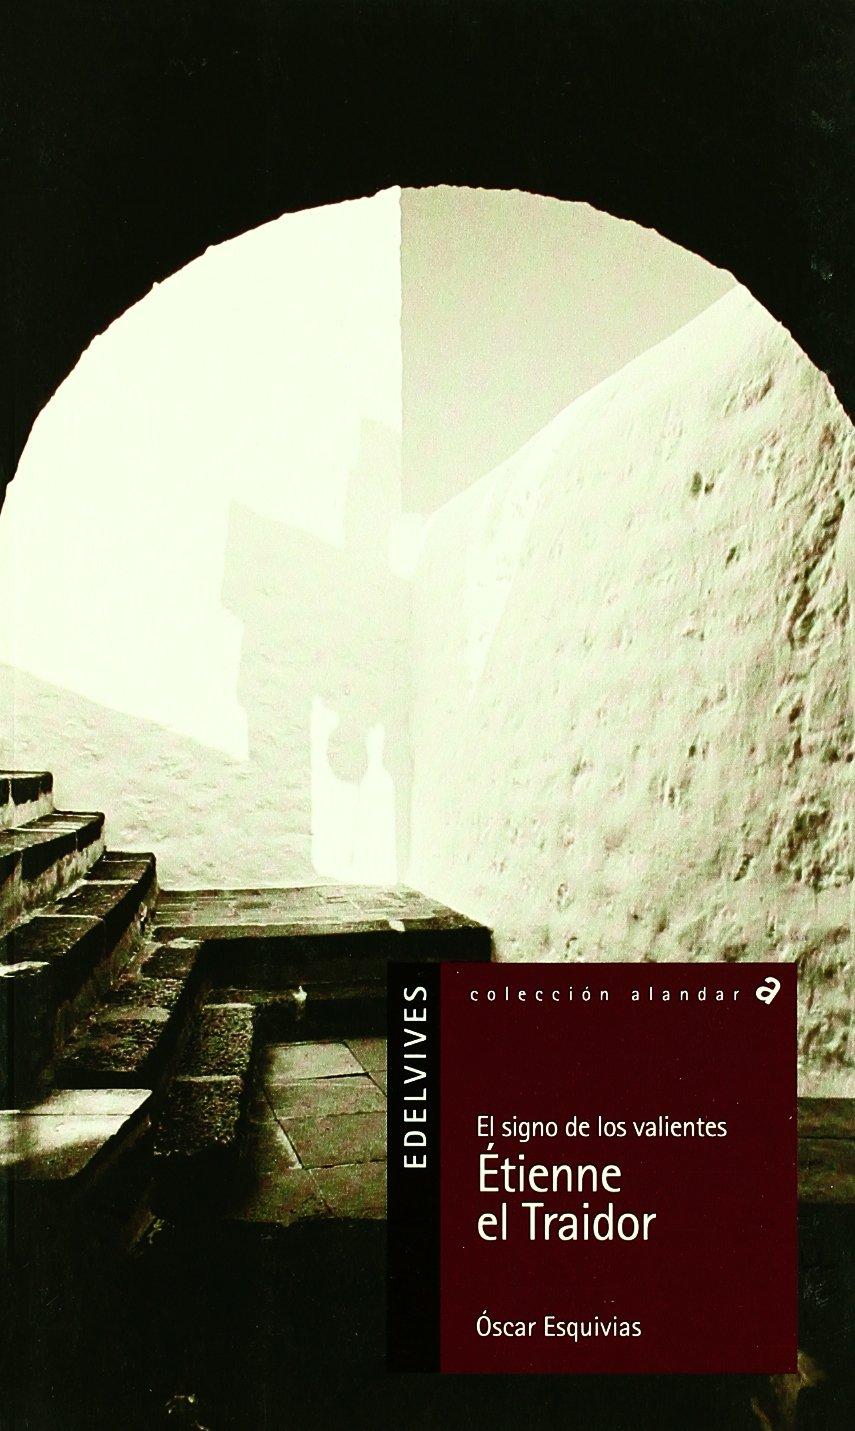 Etienne, El Traidor (Alandar) (Spanish Edition) (Spanish) Paperback – December 23, 2008